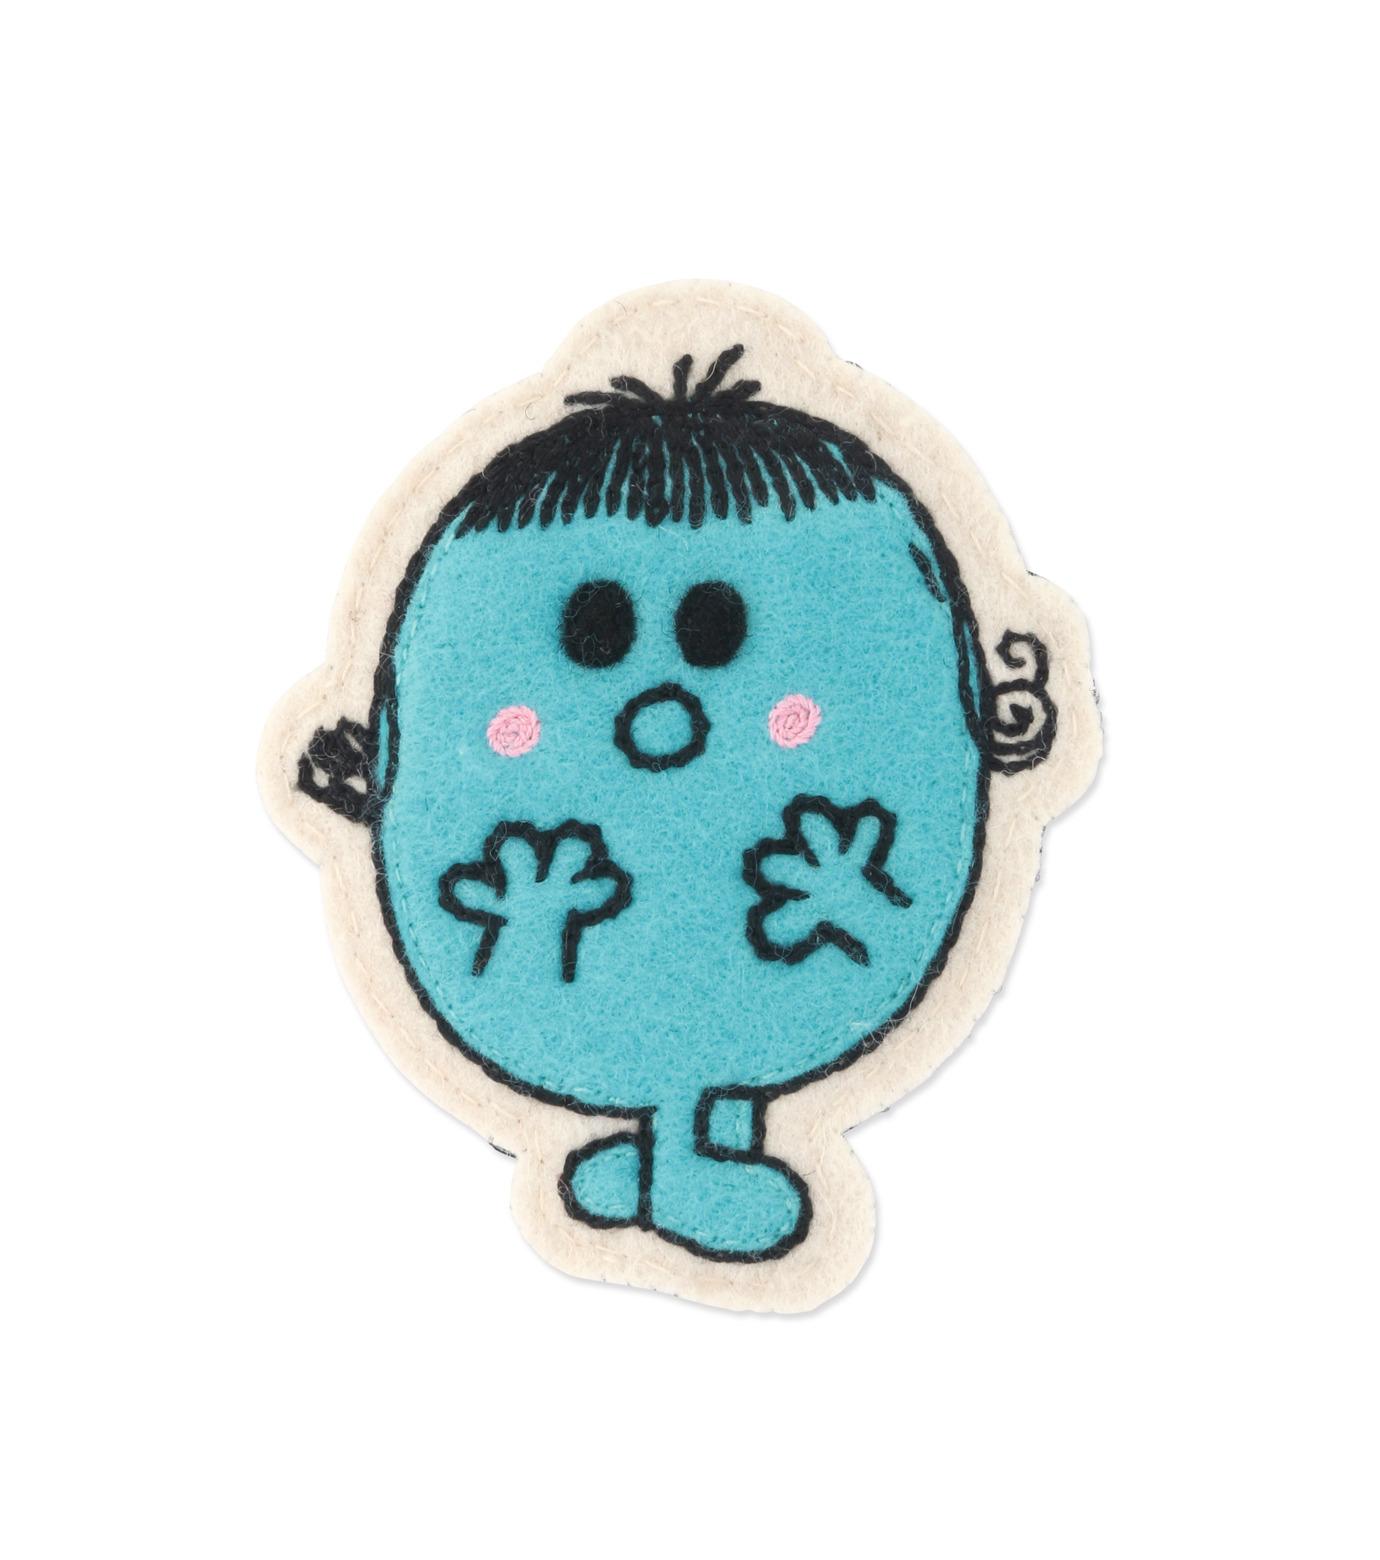 Olympia Le-Tan(オリンピア ルタン)のLittle Miss Shy Velcro Patches-TURQUOISE(アクセサリー/accessory)-FW16APA011-95 拡大詳細画像1